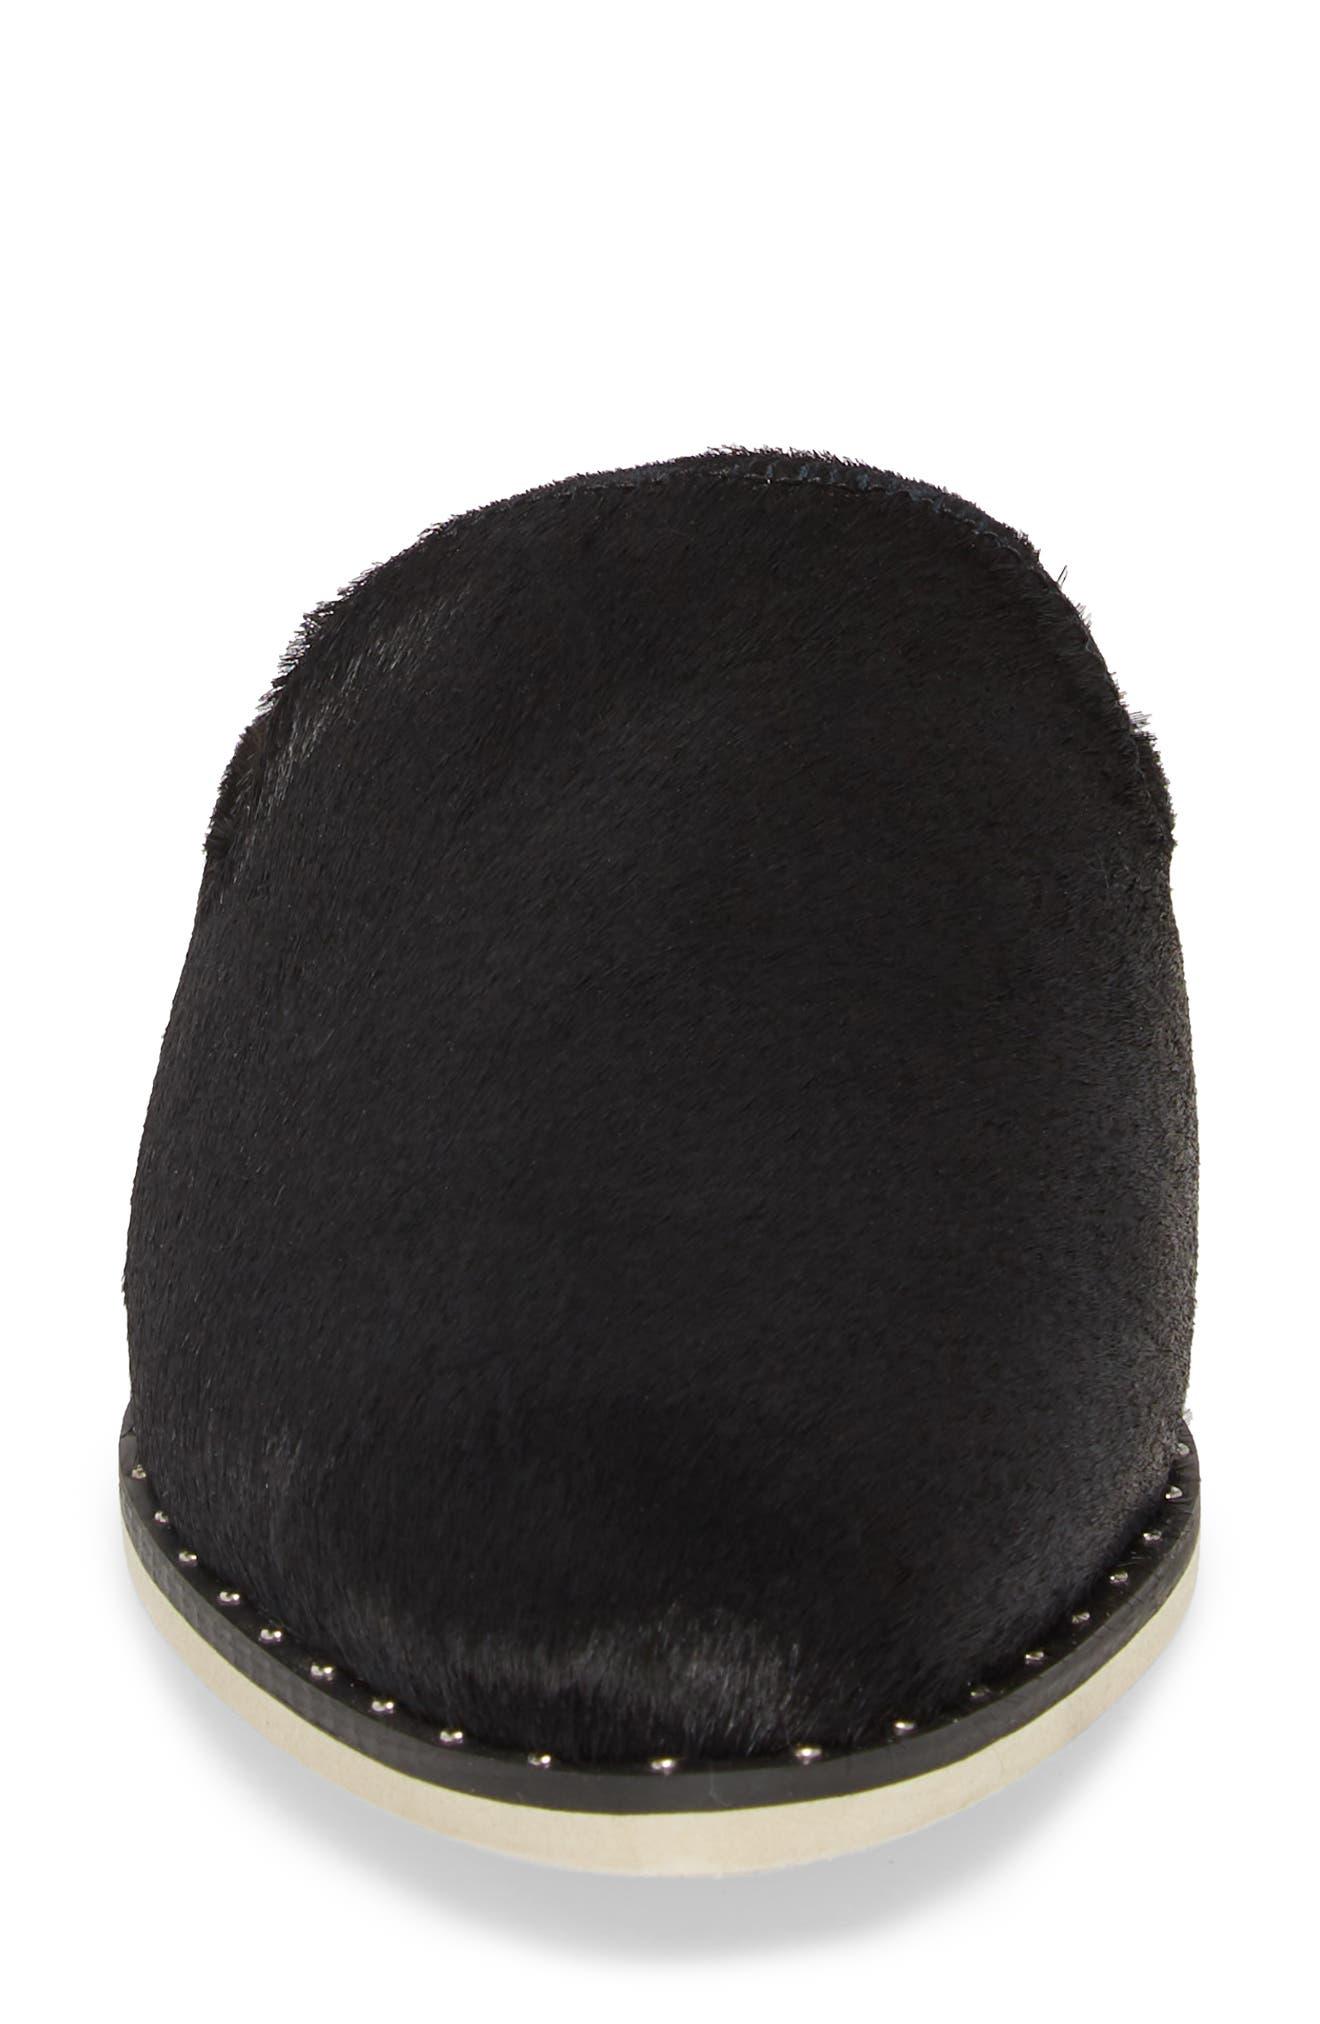 Madison Studded Genuine Calf Hair Loafer Mule,                             Alternate thumbnail 3, color,                             Black Calf Hair